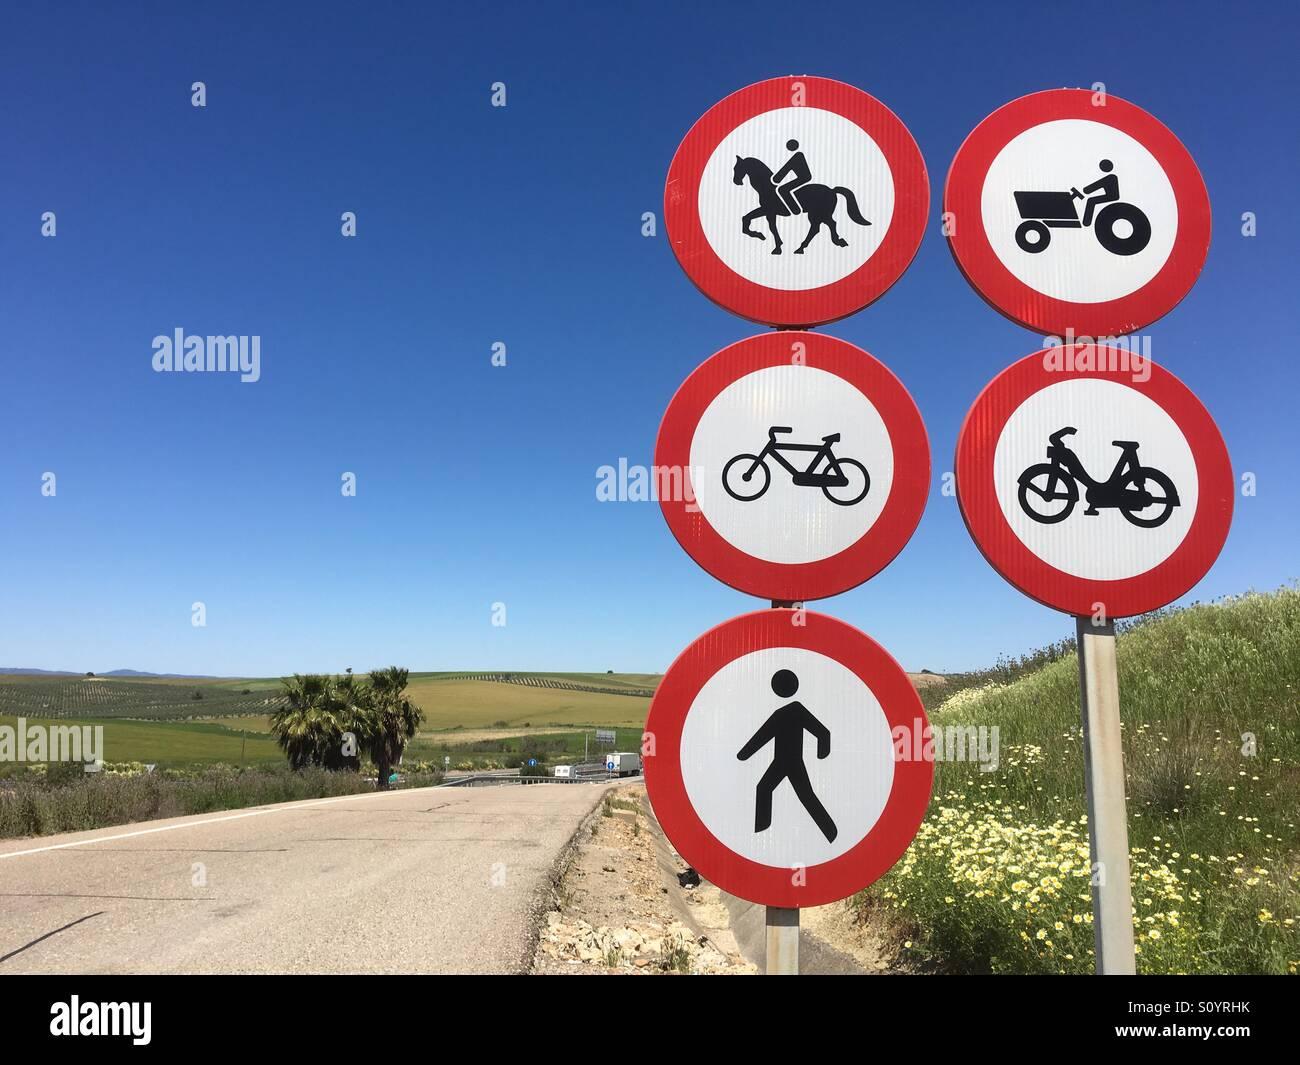 Spanish Traffic Signal Limited Speed 30km Stock Photo (Edit Now ...